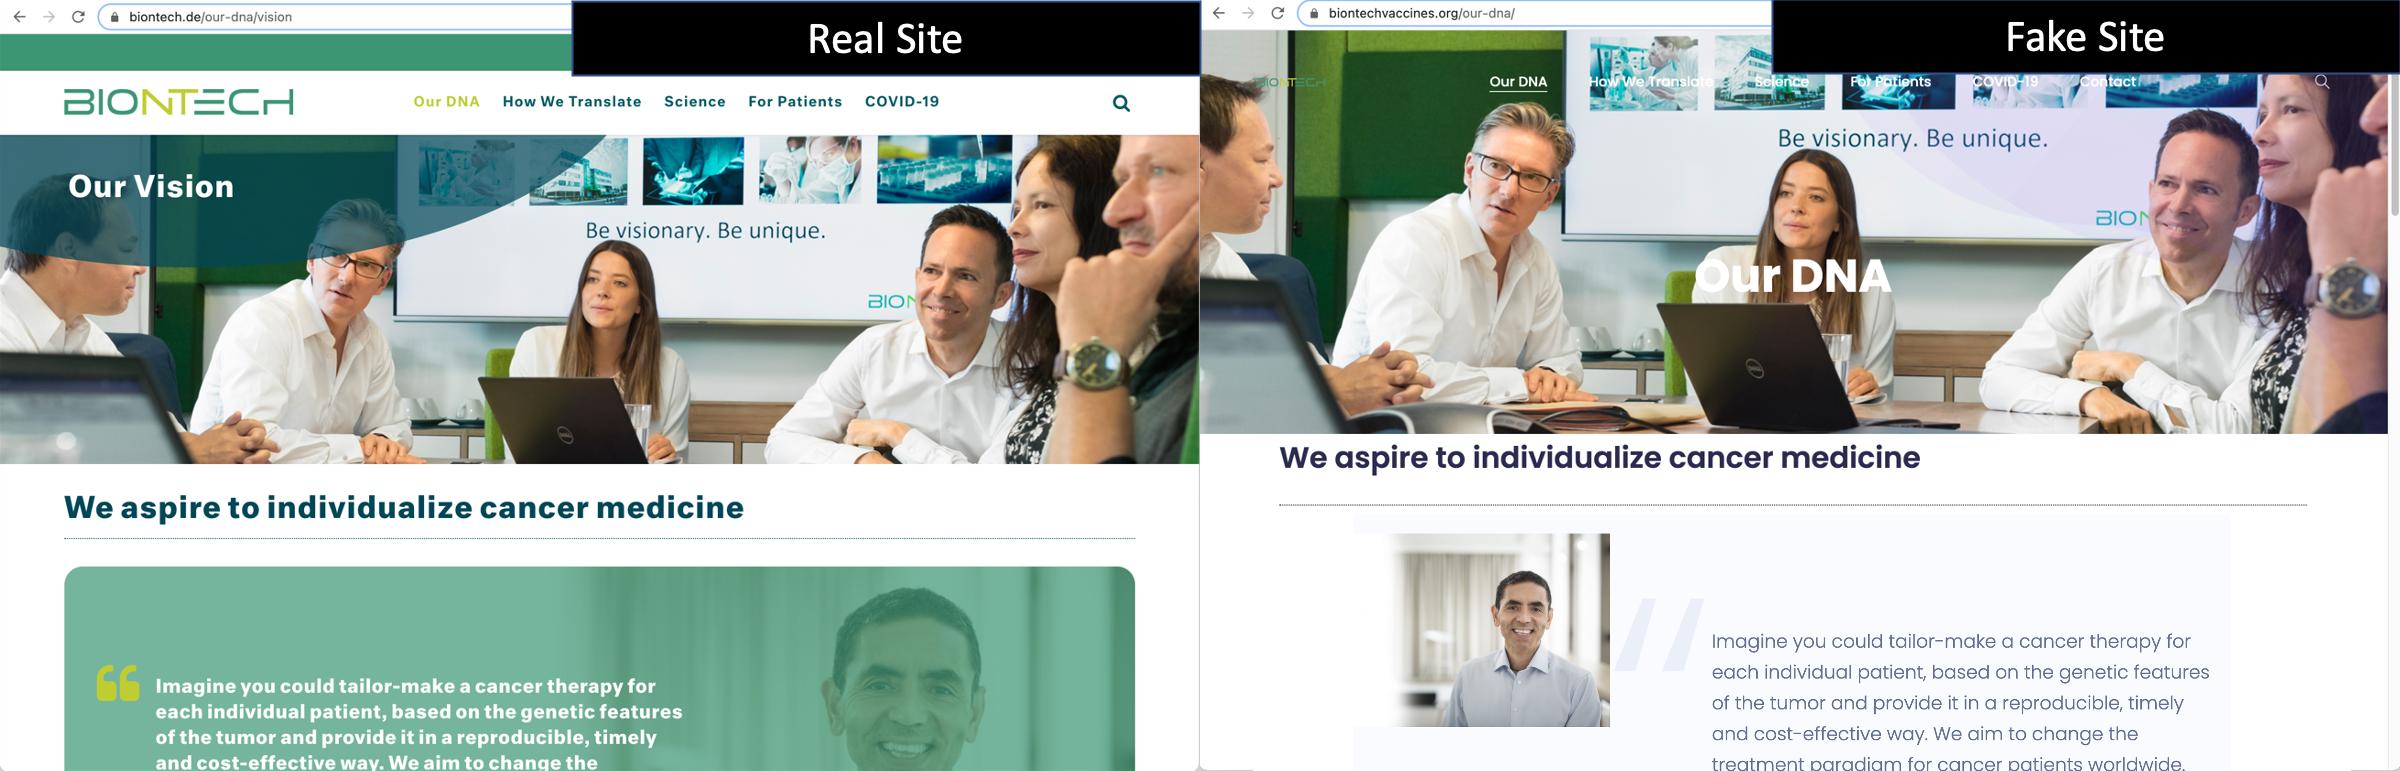 fake.biontech.website